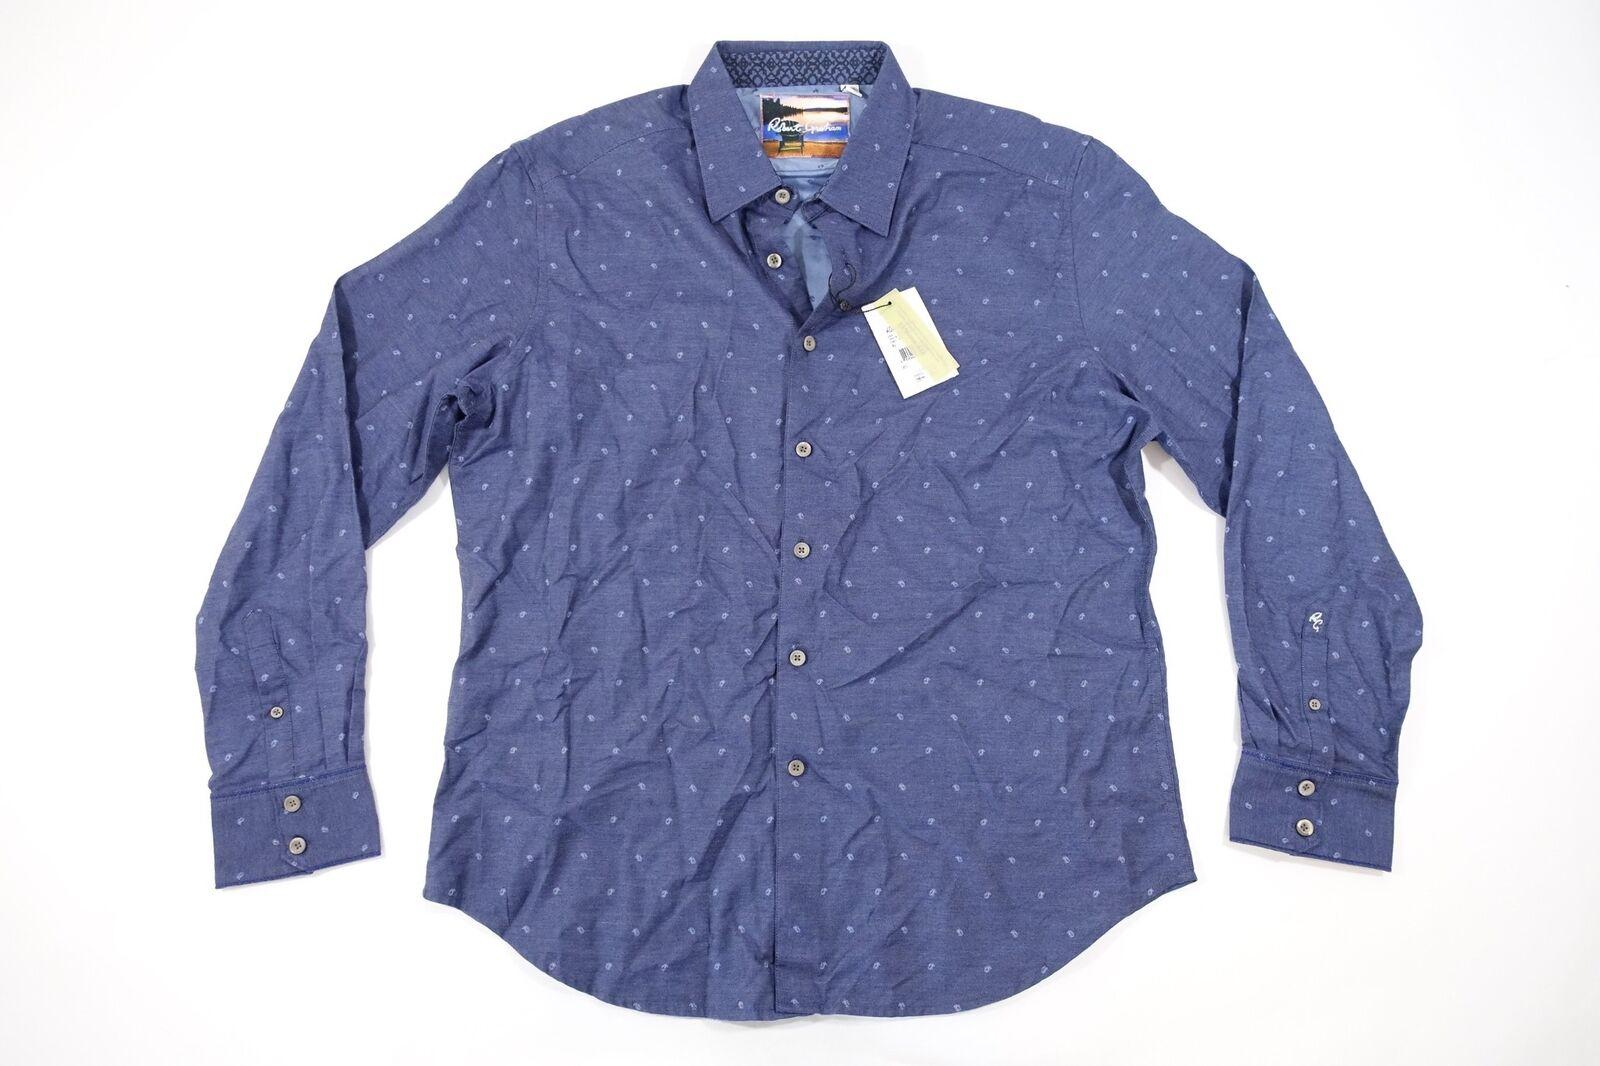 ROBERT GRAHAM GOUVERNEUR PAISLEY blueE XL CLASSIC FIT BUTTON FRONT SHIRT NWT NEW